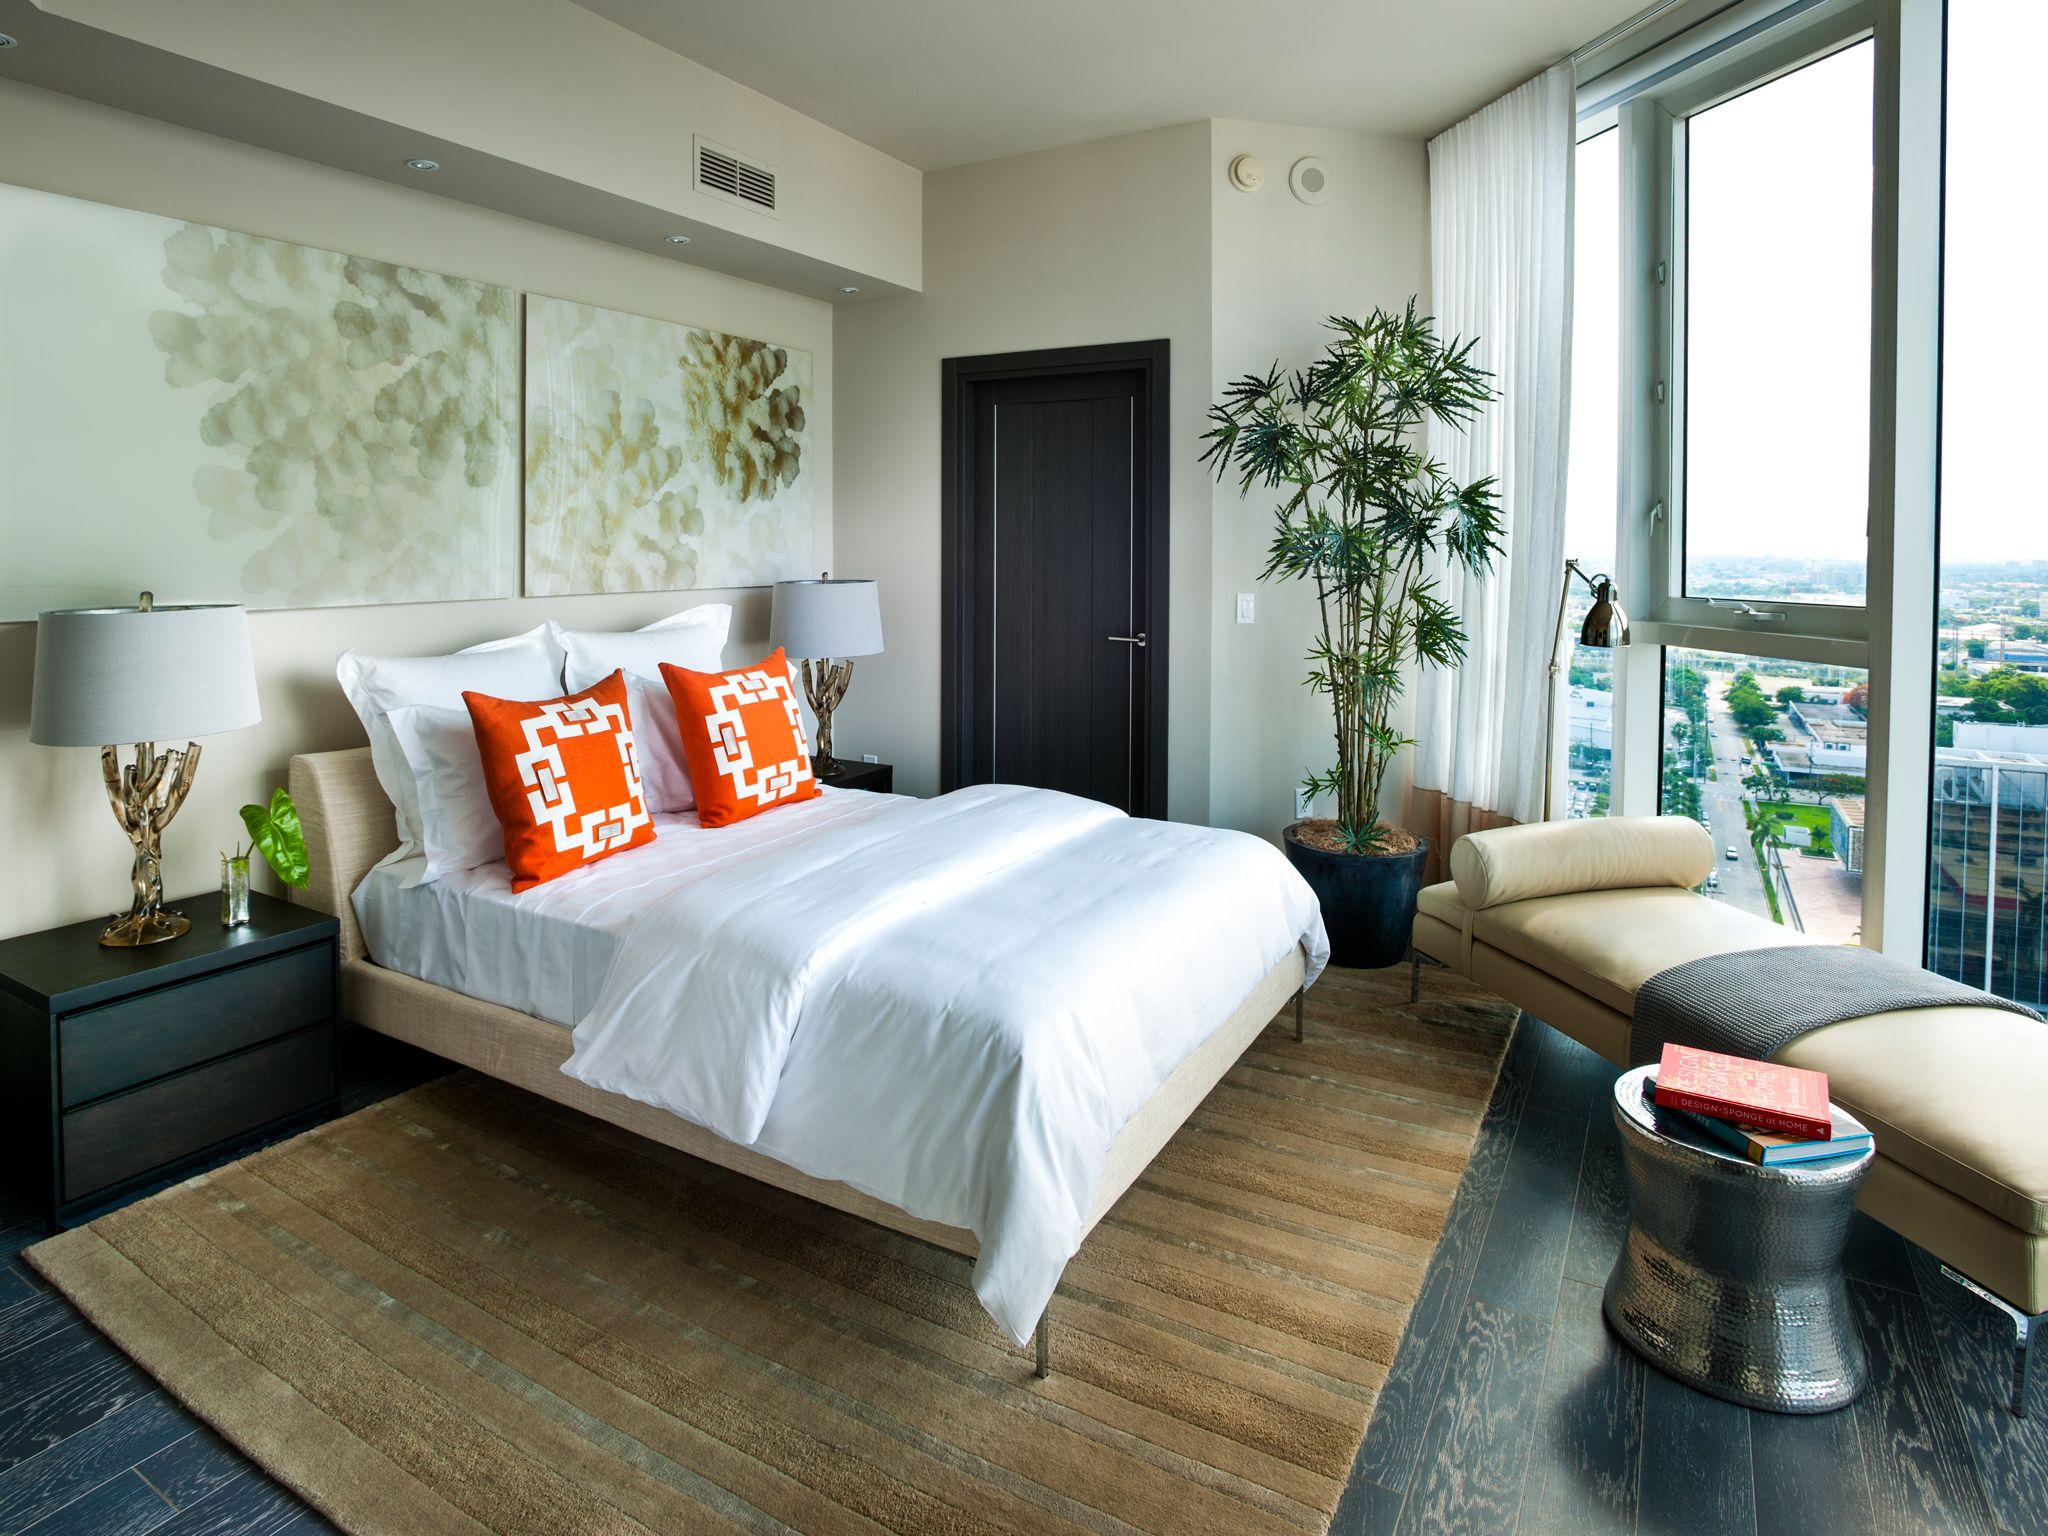 Designer Bedroom Colors Property Brothers Designs Bedrooms  Buscar Con Google